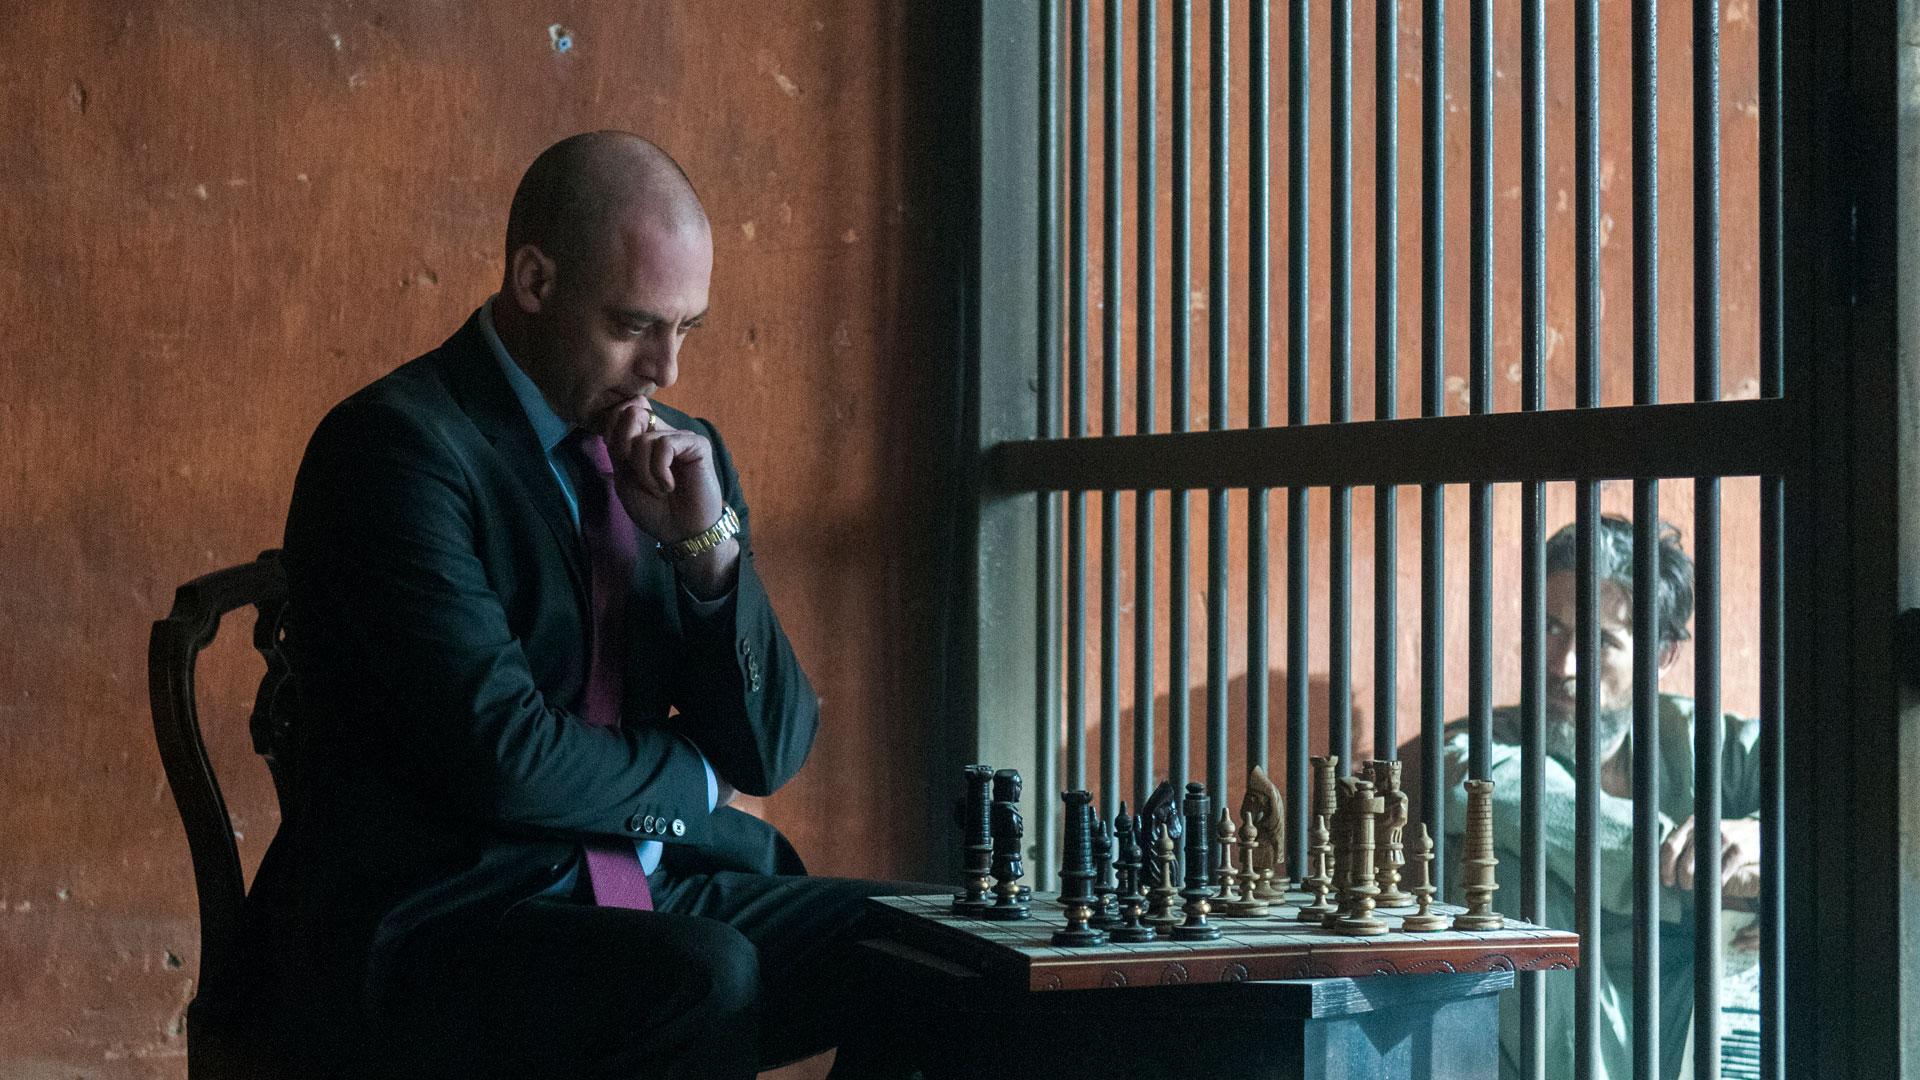 'Tyrant' Season 2: Howard Gordon on Real-World Impact, 'Game of Thrones' Comparisons